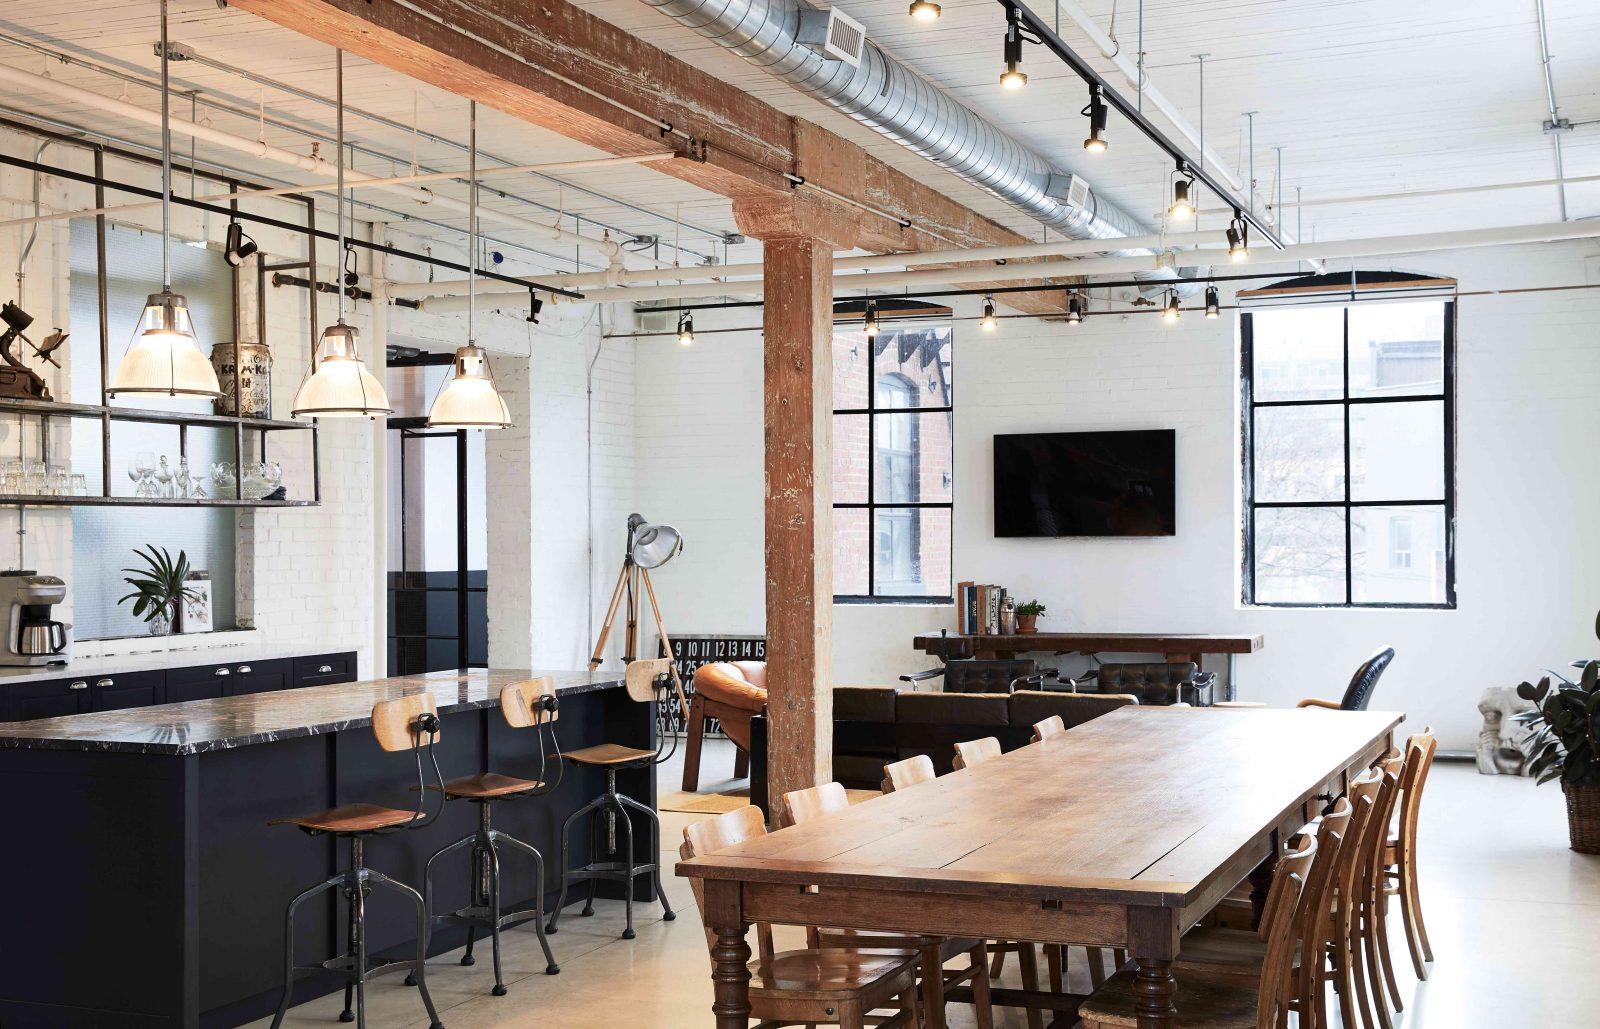 East Room co-working club, Toronto ©Michael Graydon